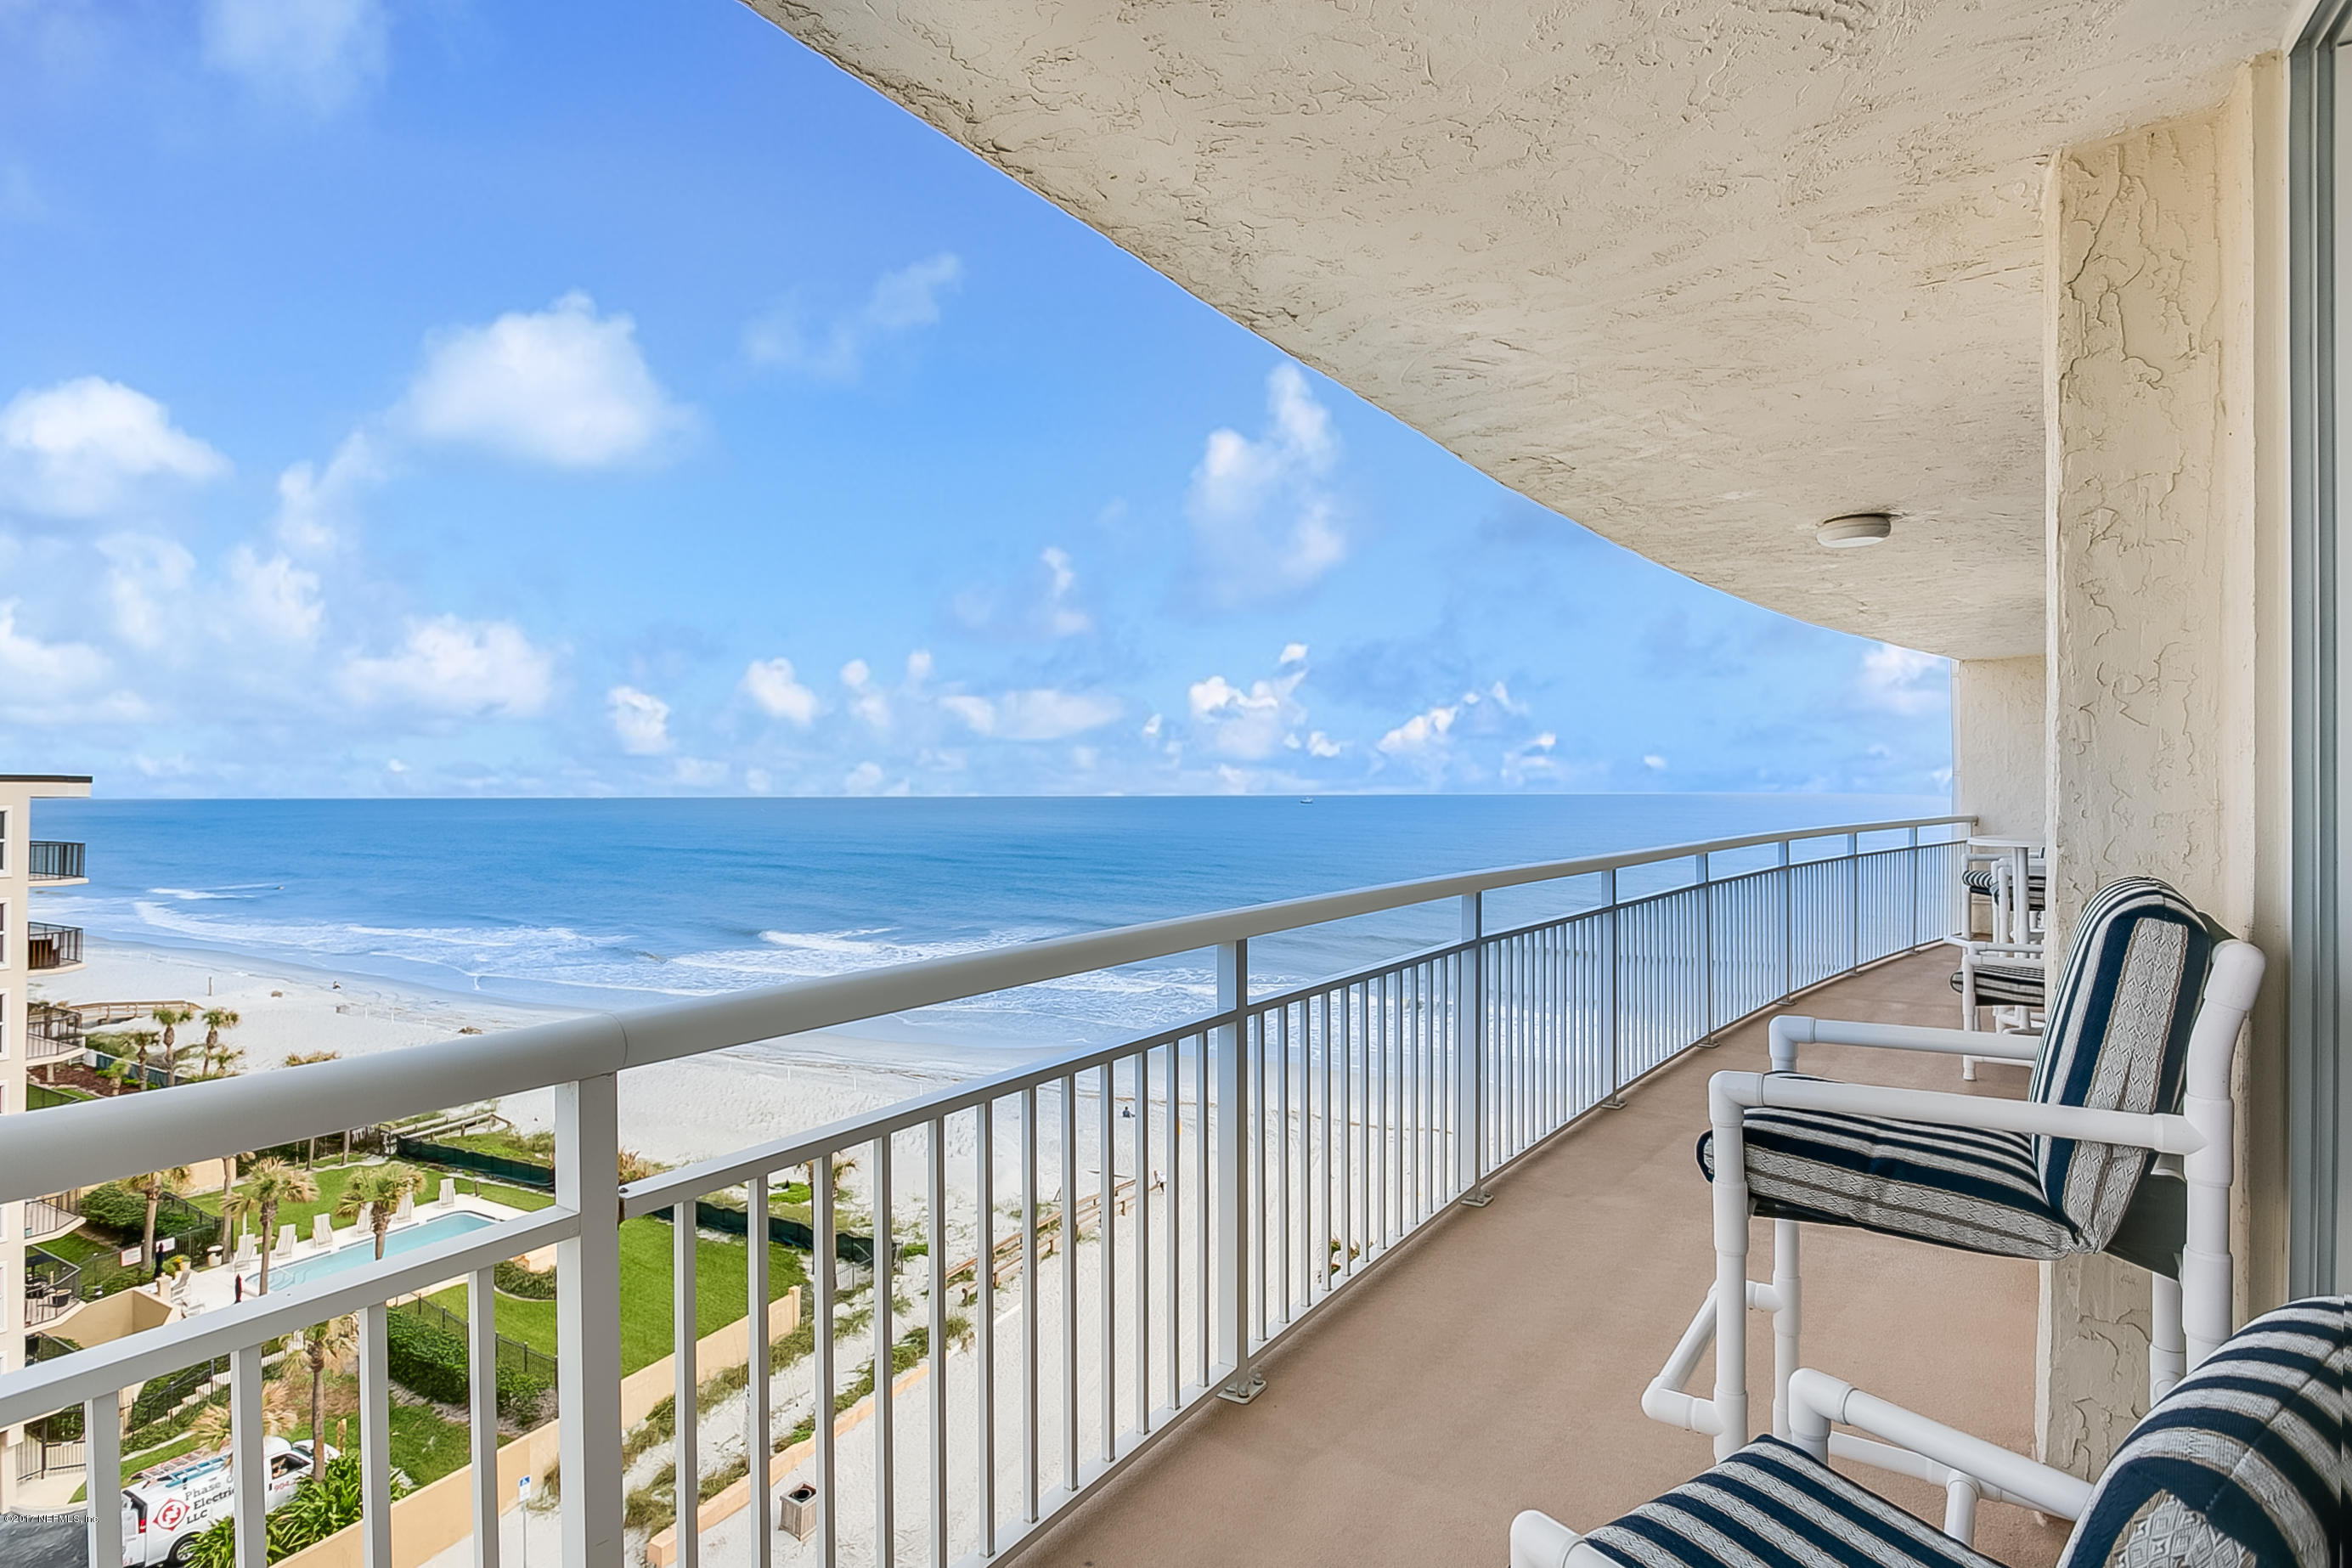 1601 OCEAN, JACKSONVILLE BEACH, FLORIDA 32250, 2 Bedrooms Bedrooms, ,2 BathroomsBathrooms,Residential - condos/townhomes,For sale,OCEAN,1008460